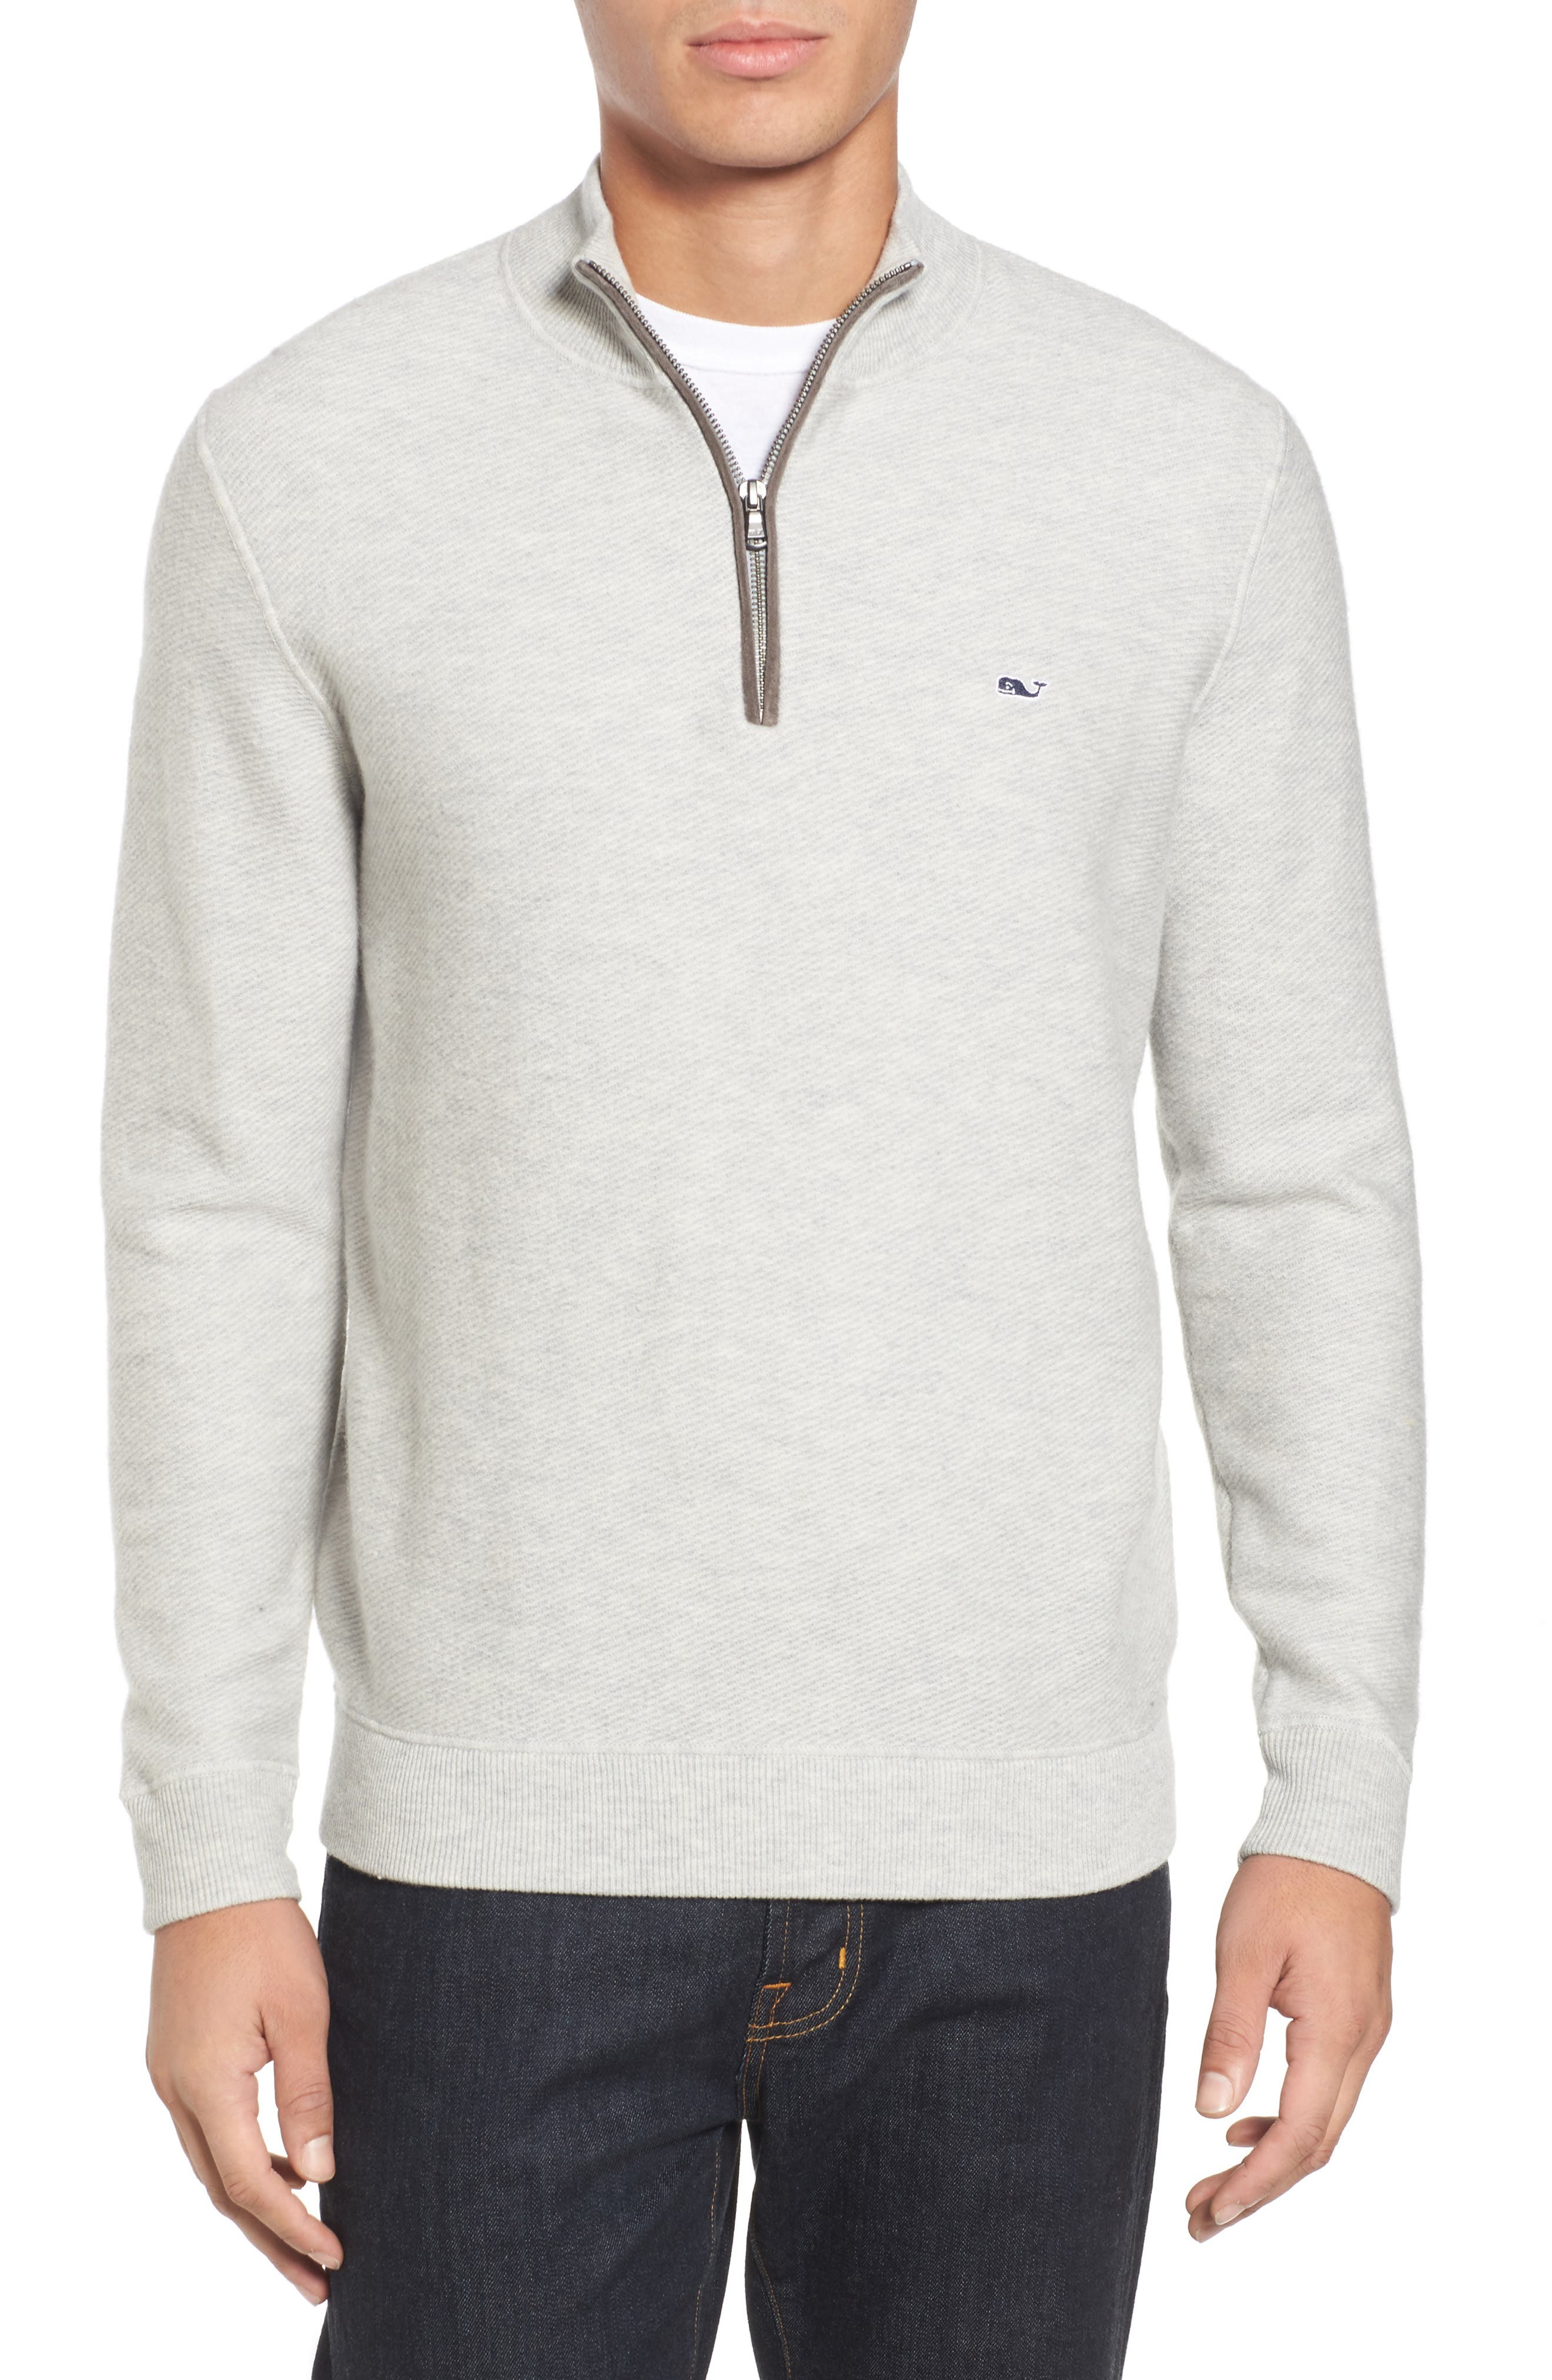 Merino Wool Twill Stitch Quarter Zip Sweater,                             Main thumbnail 1, color,                             039